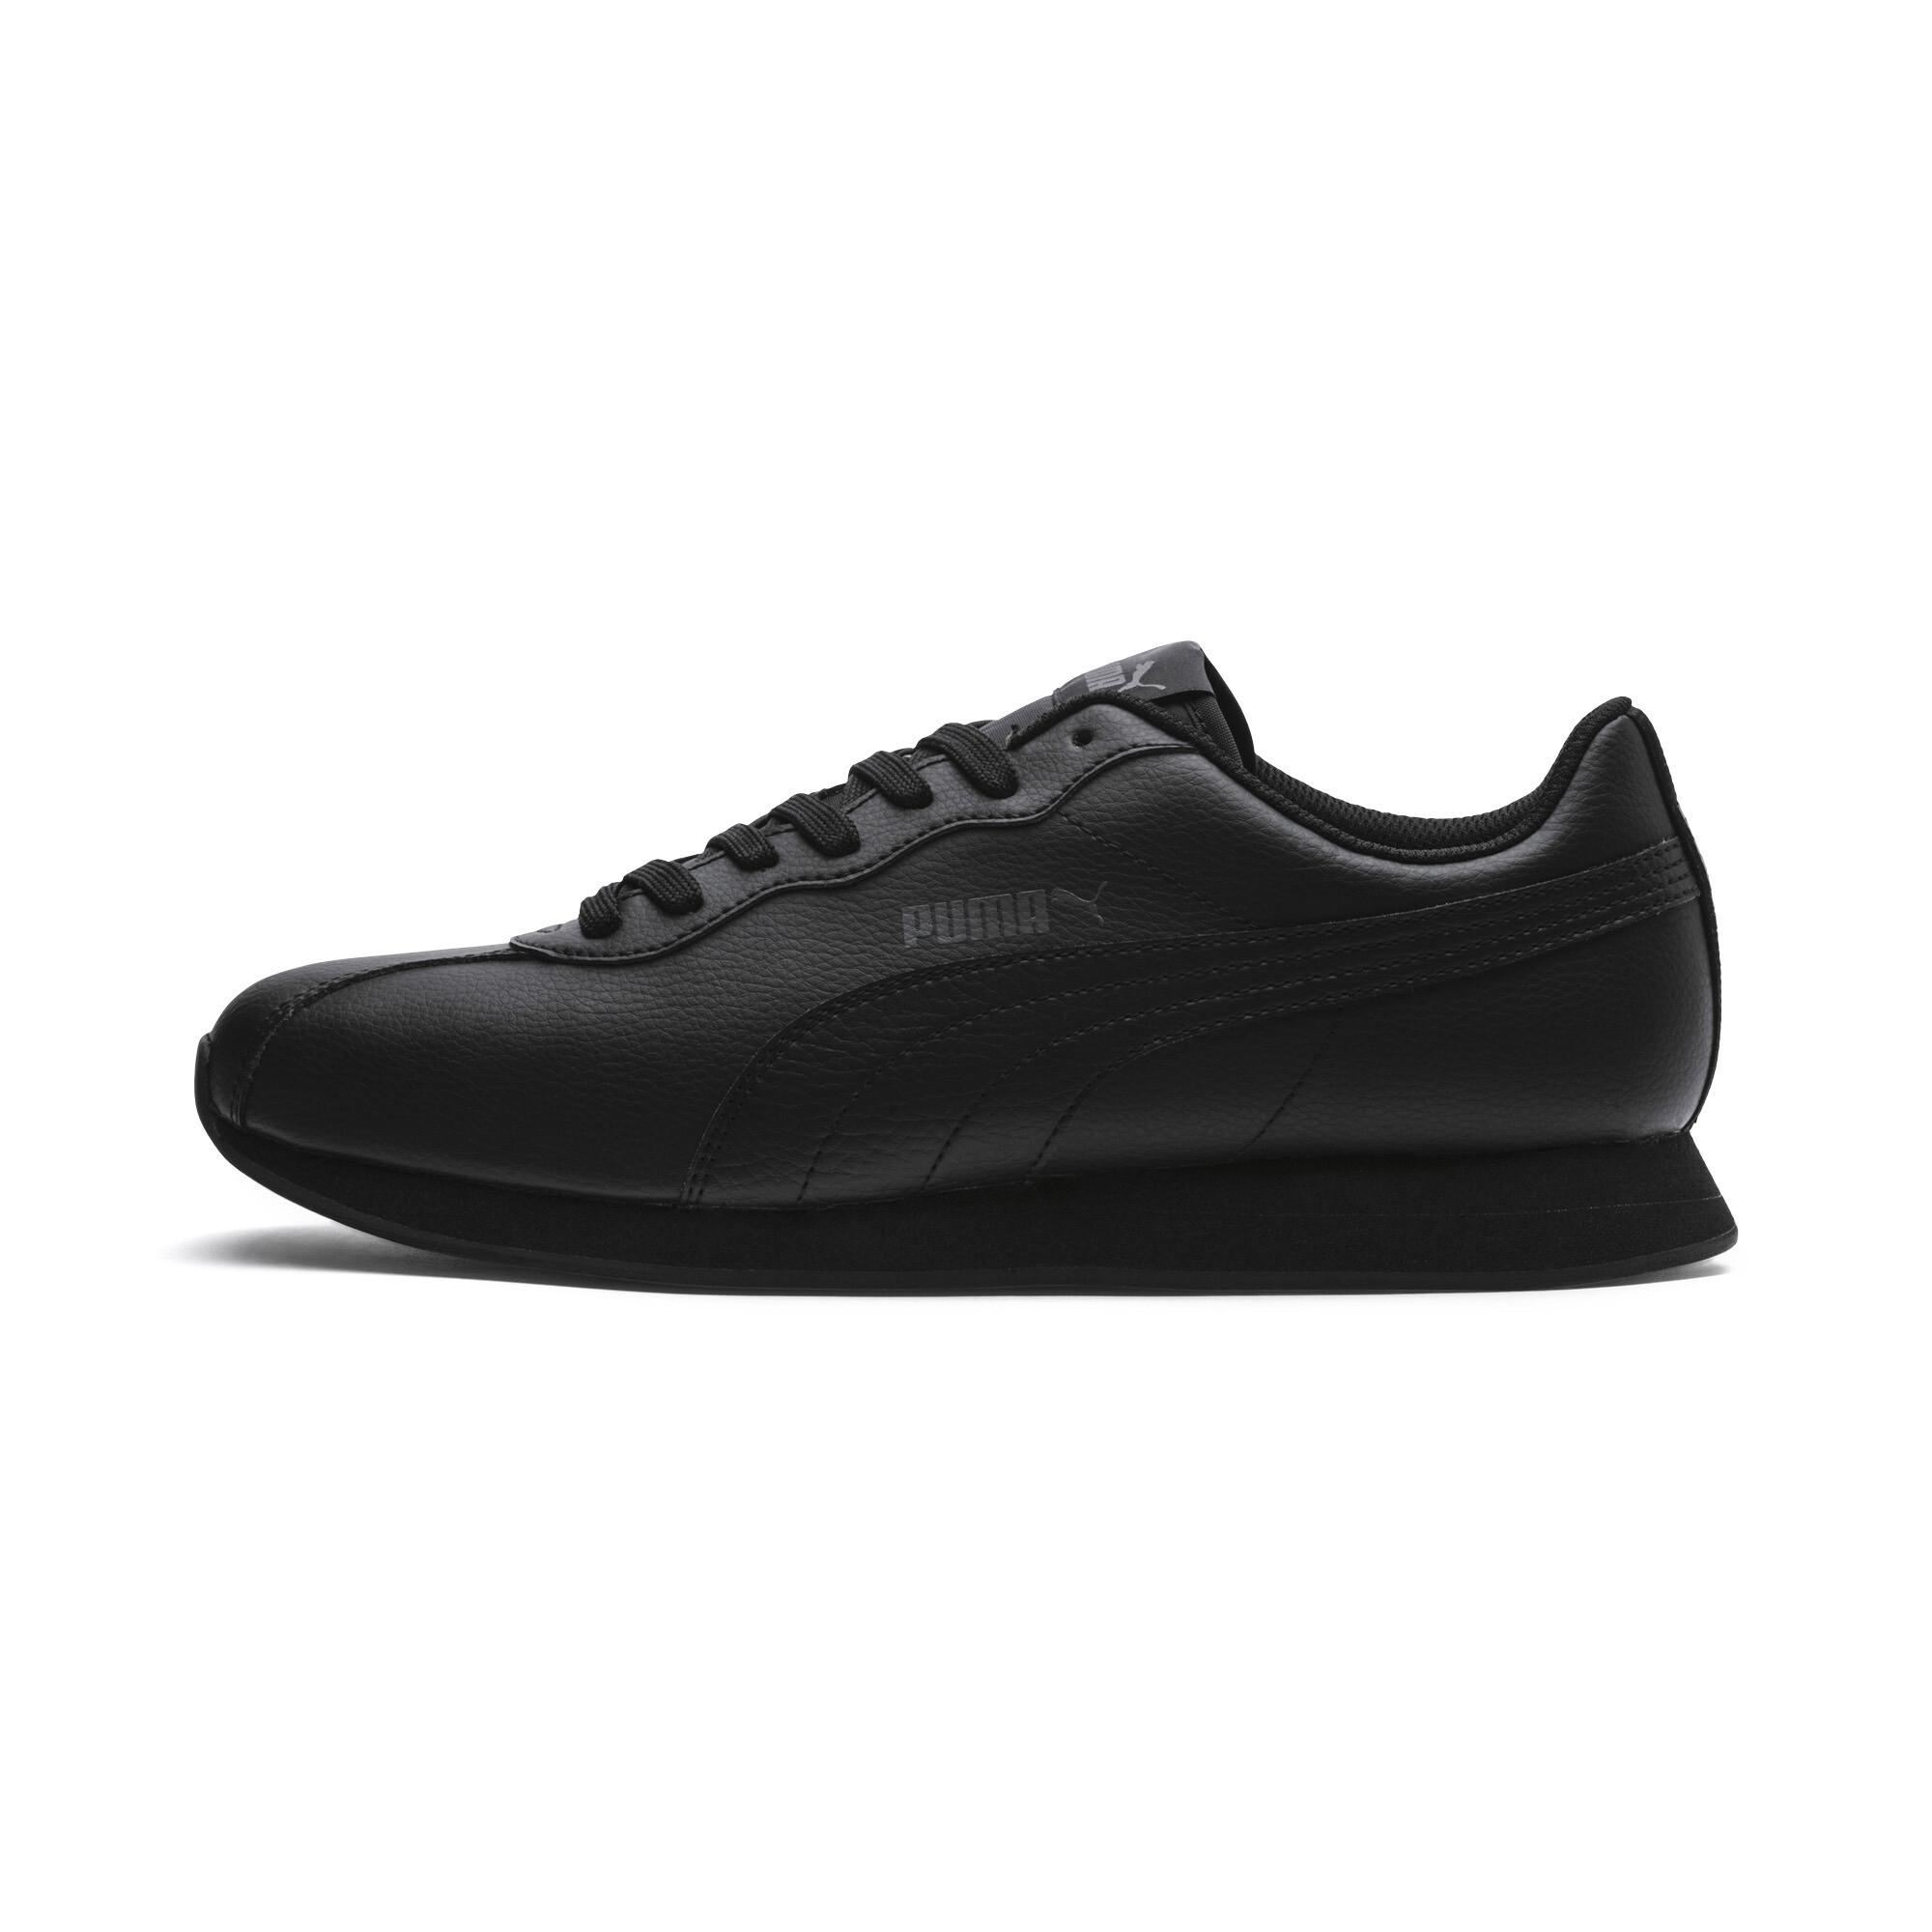 PUMA-Men-039-s-Turin-II-Sneakers thumbnail 4